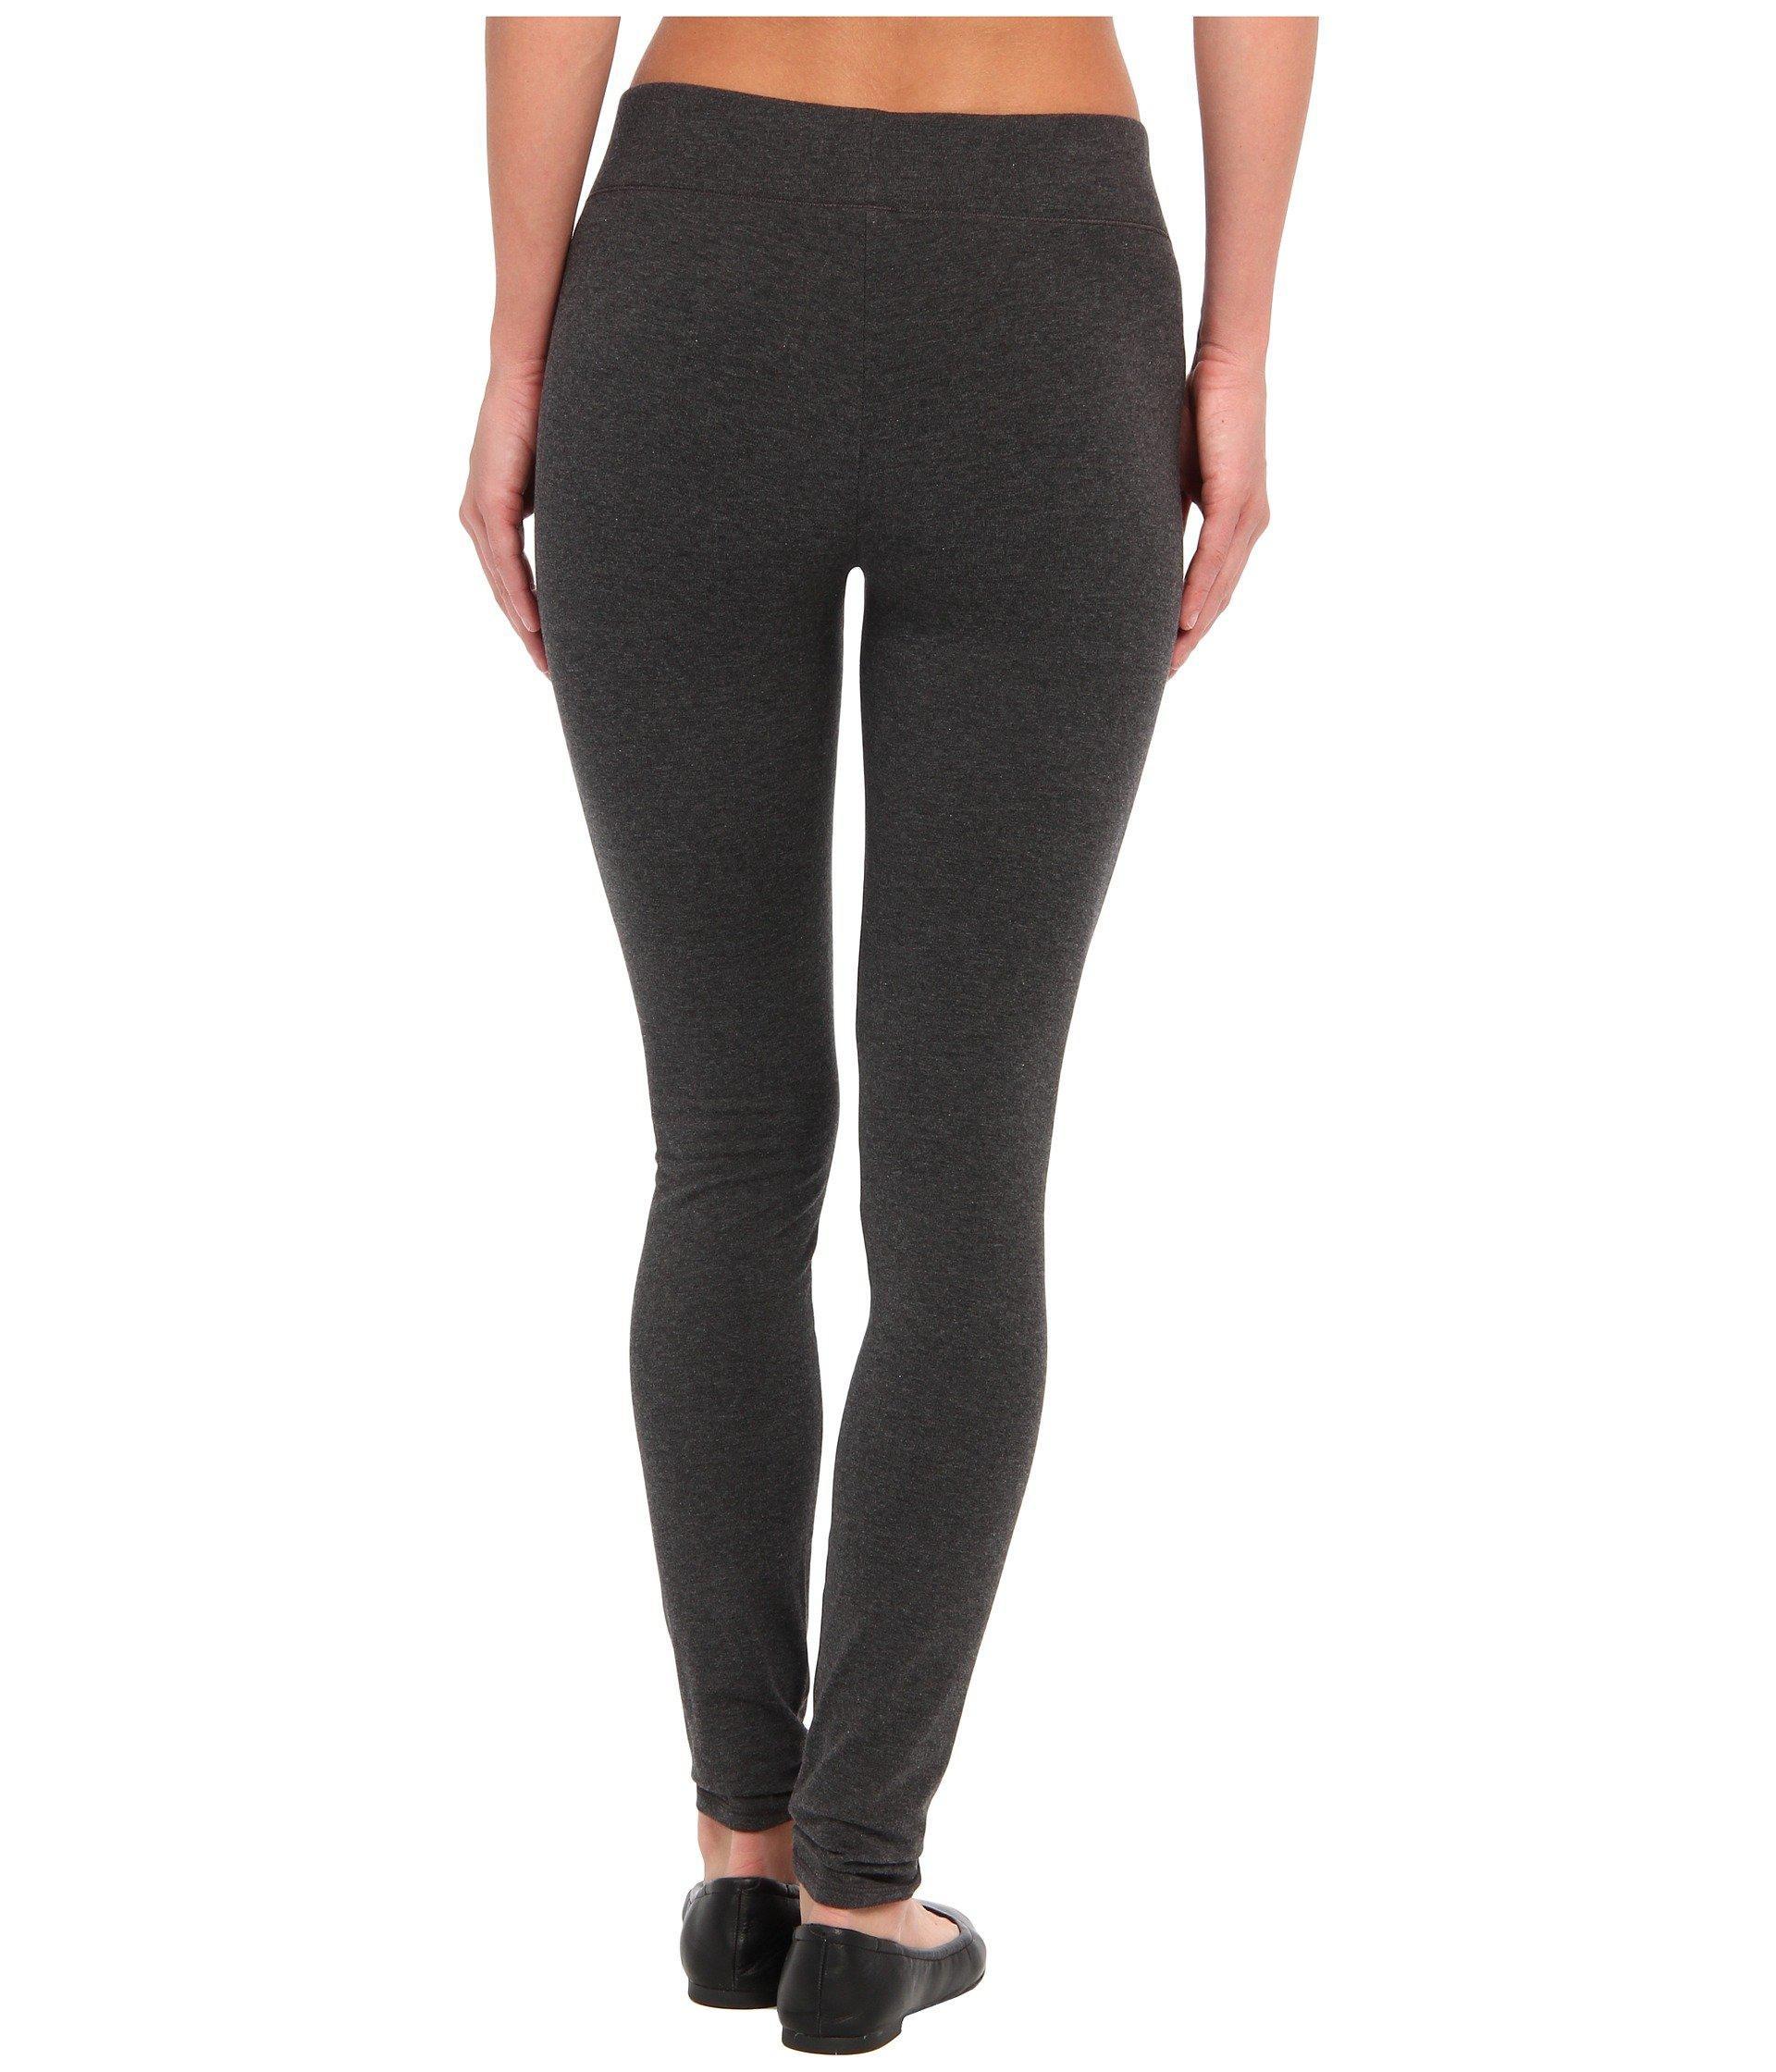 3bde22ada39 Hue - Gray Ultra Leggings W  Wide Waistband (black) Women s Clothing -  Lyst. View fullscreen